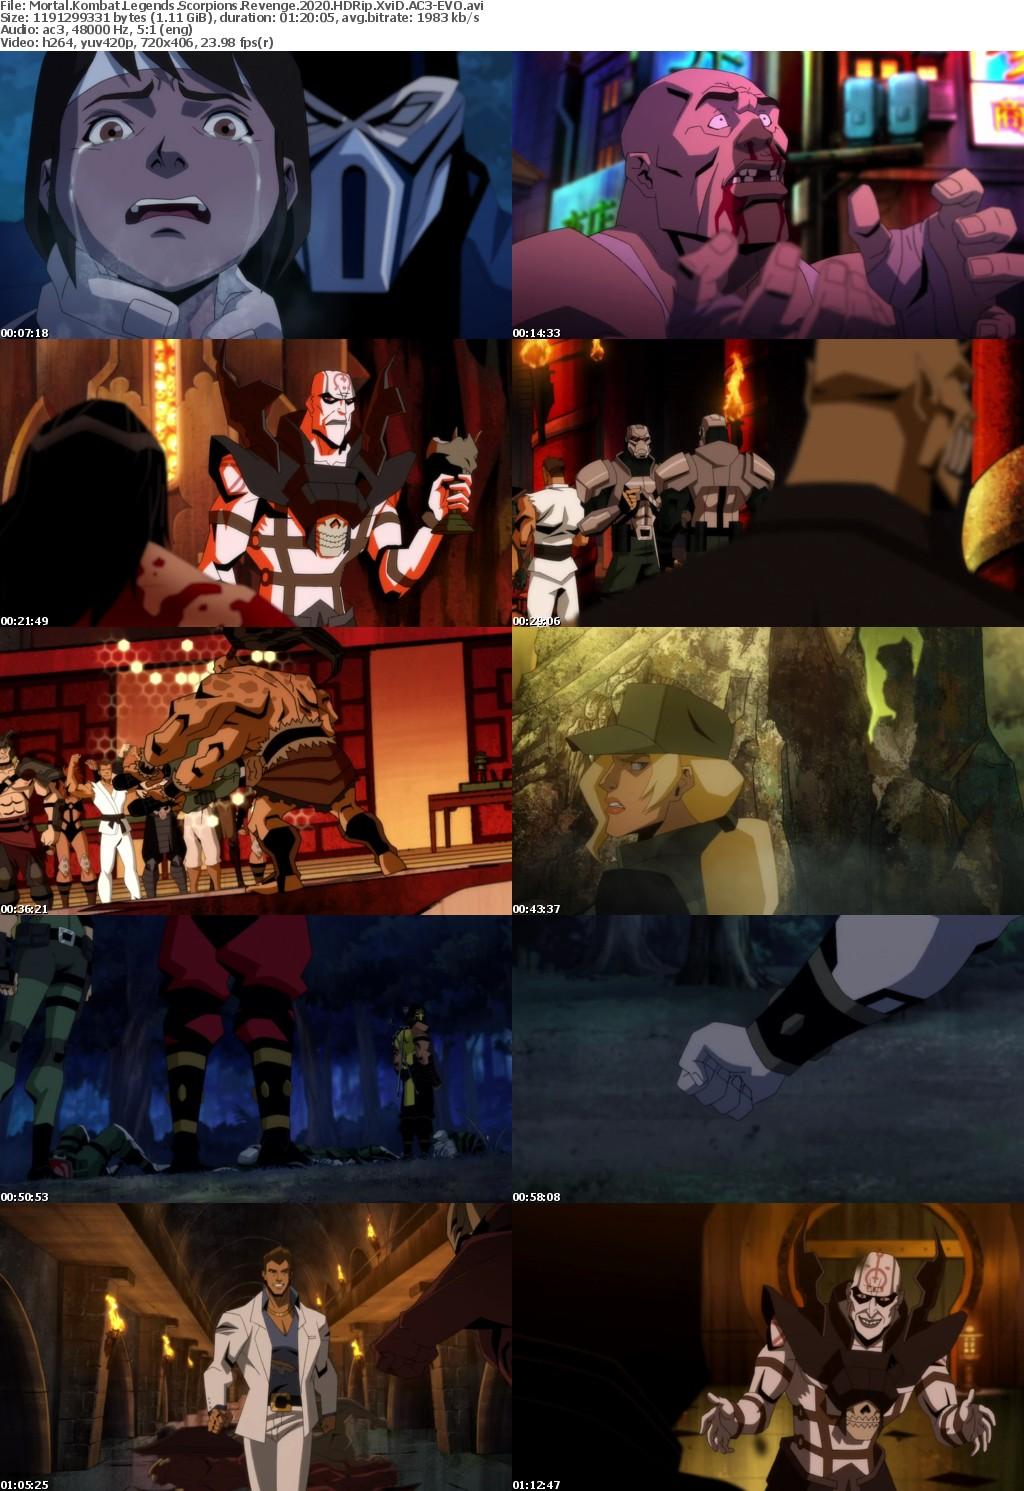 Mortal Kombat Legends Scorpions Revenge (2020) HDRip XviD AC3-EVO